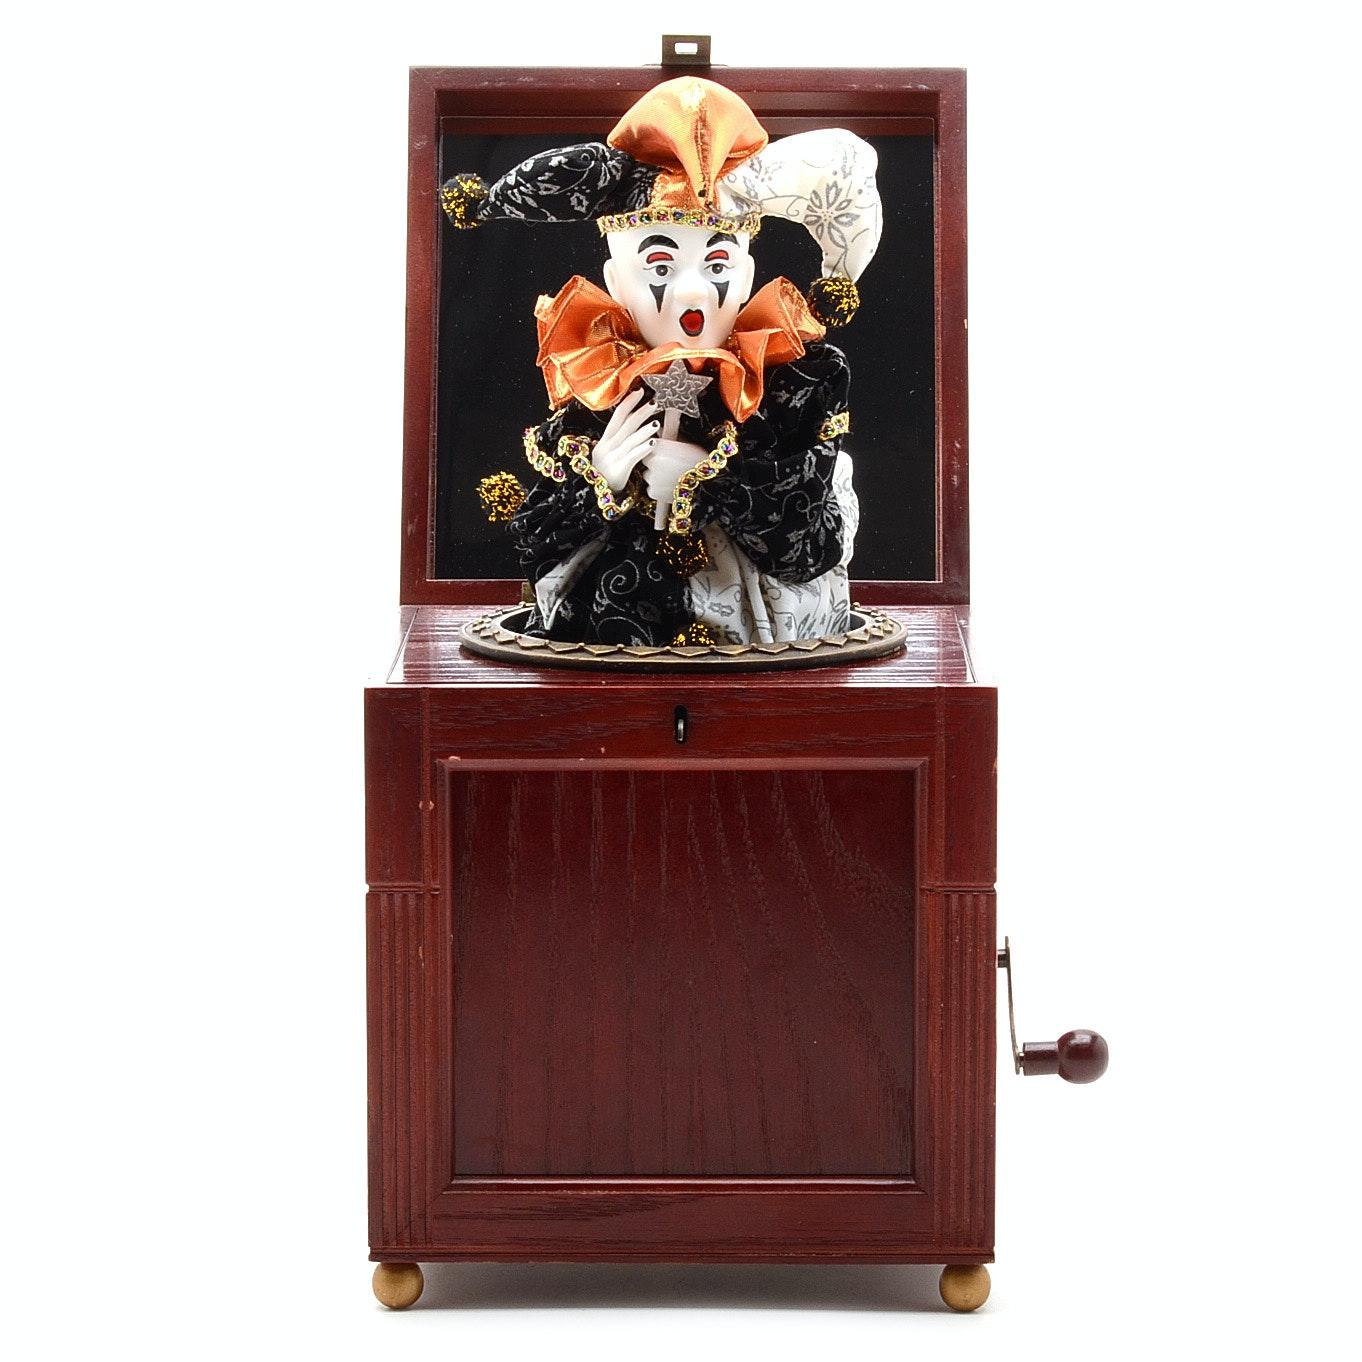 1900-2000 Thomas Pacconi Classics Jack in the Box